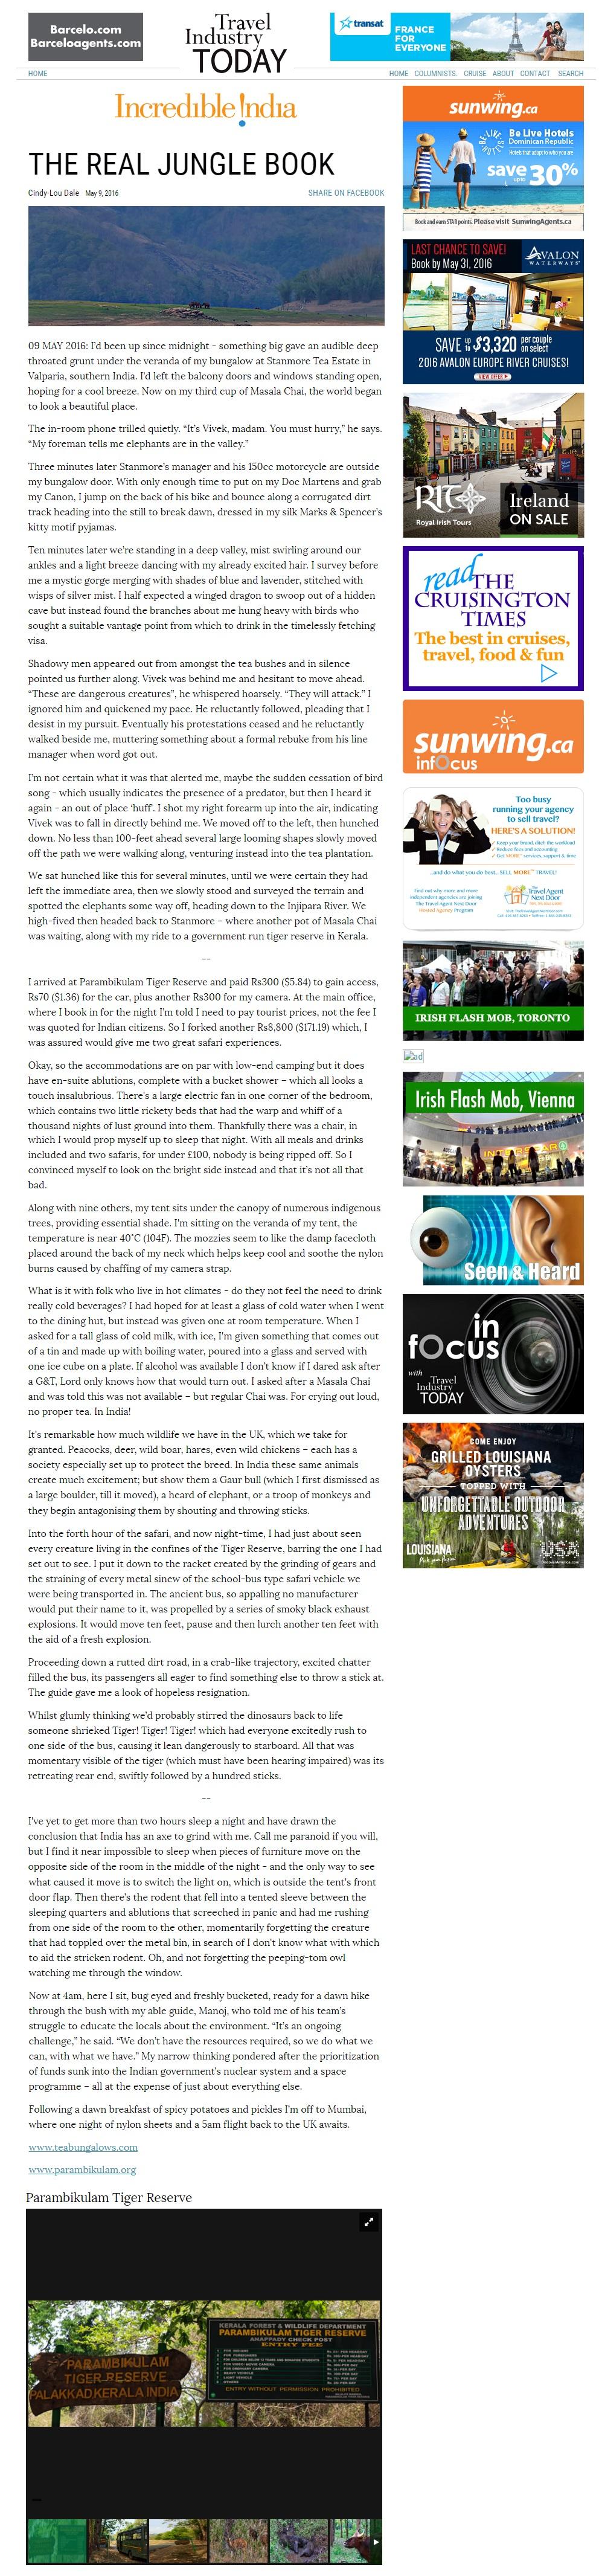 TravelIndustryTodayTheRealJungleBook